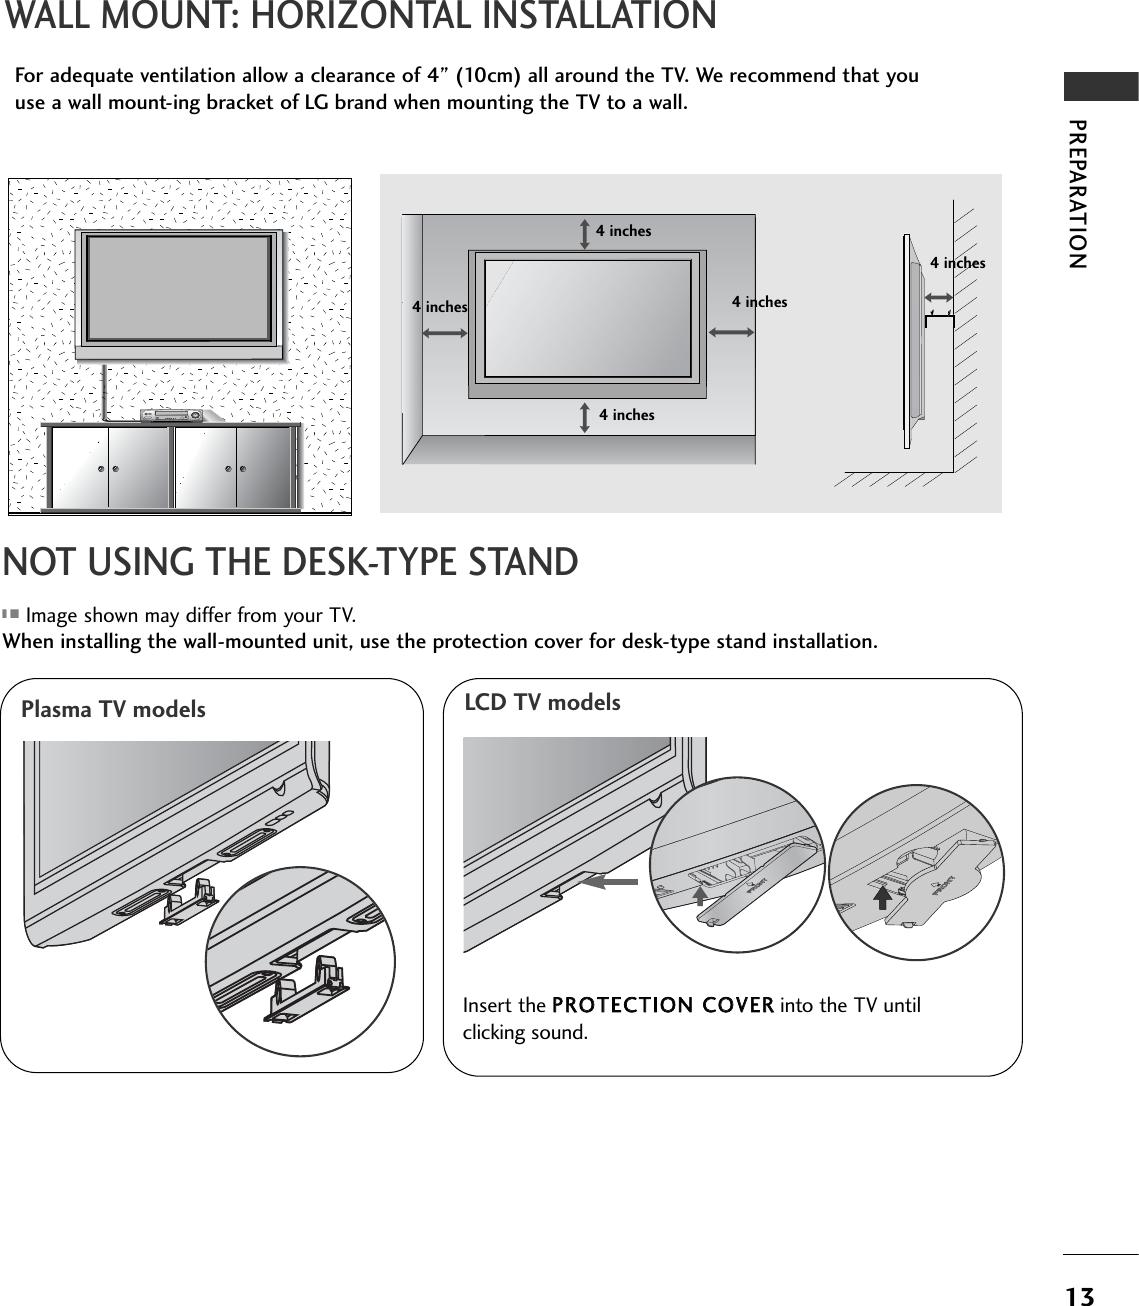 Lg 32Lg7000 Za Aekqlvg Owner S Manual SAC31539703_en_REV00_PQ